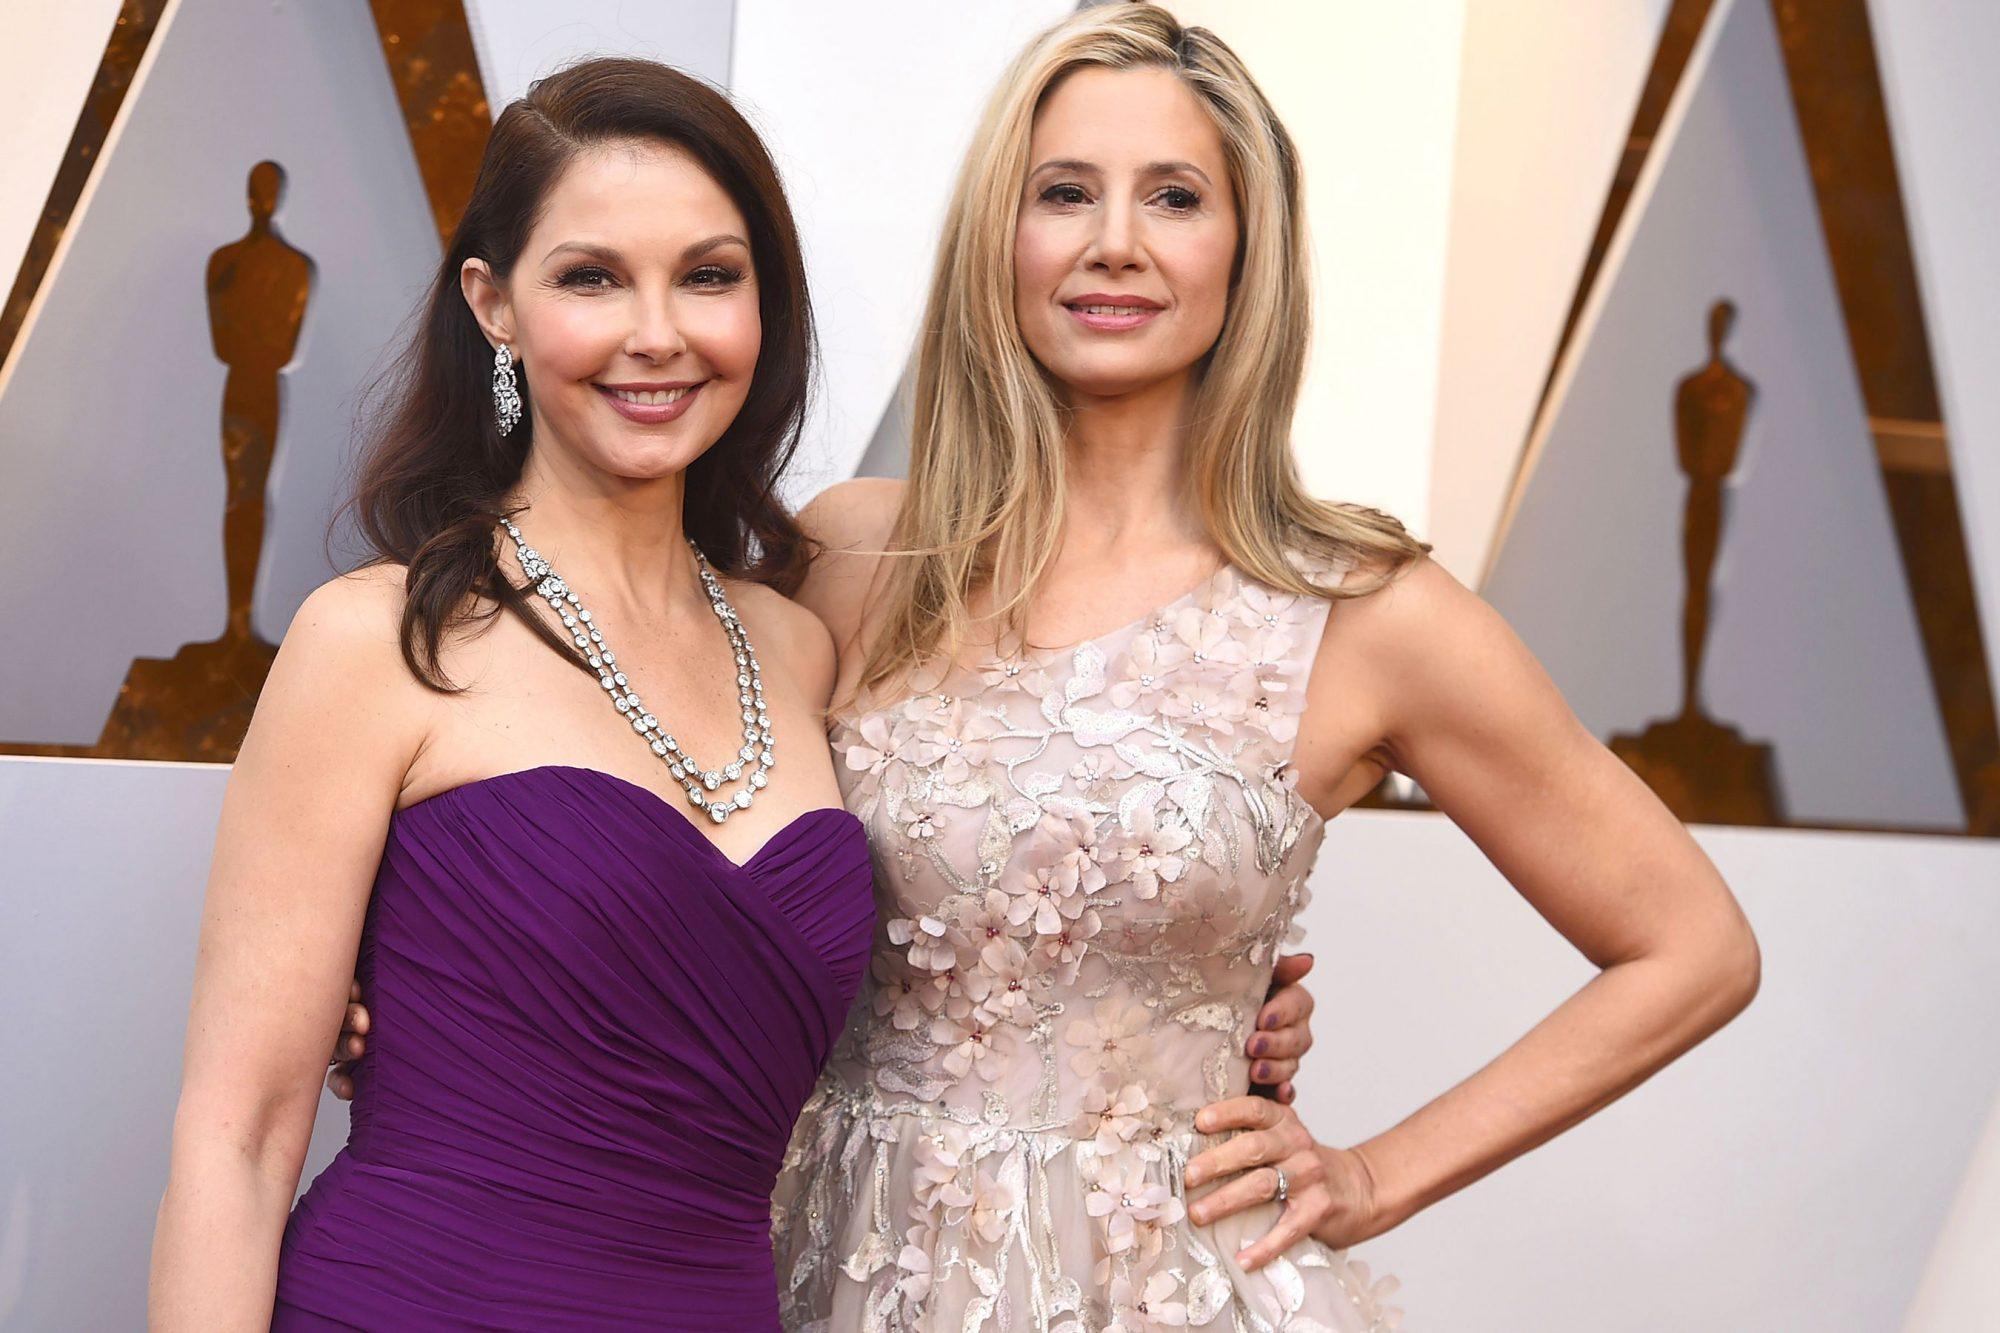 90th Academy Awards - Arrivals, Los Angeles, USA - 04 Mar 2018